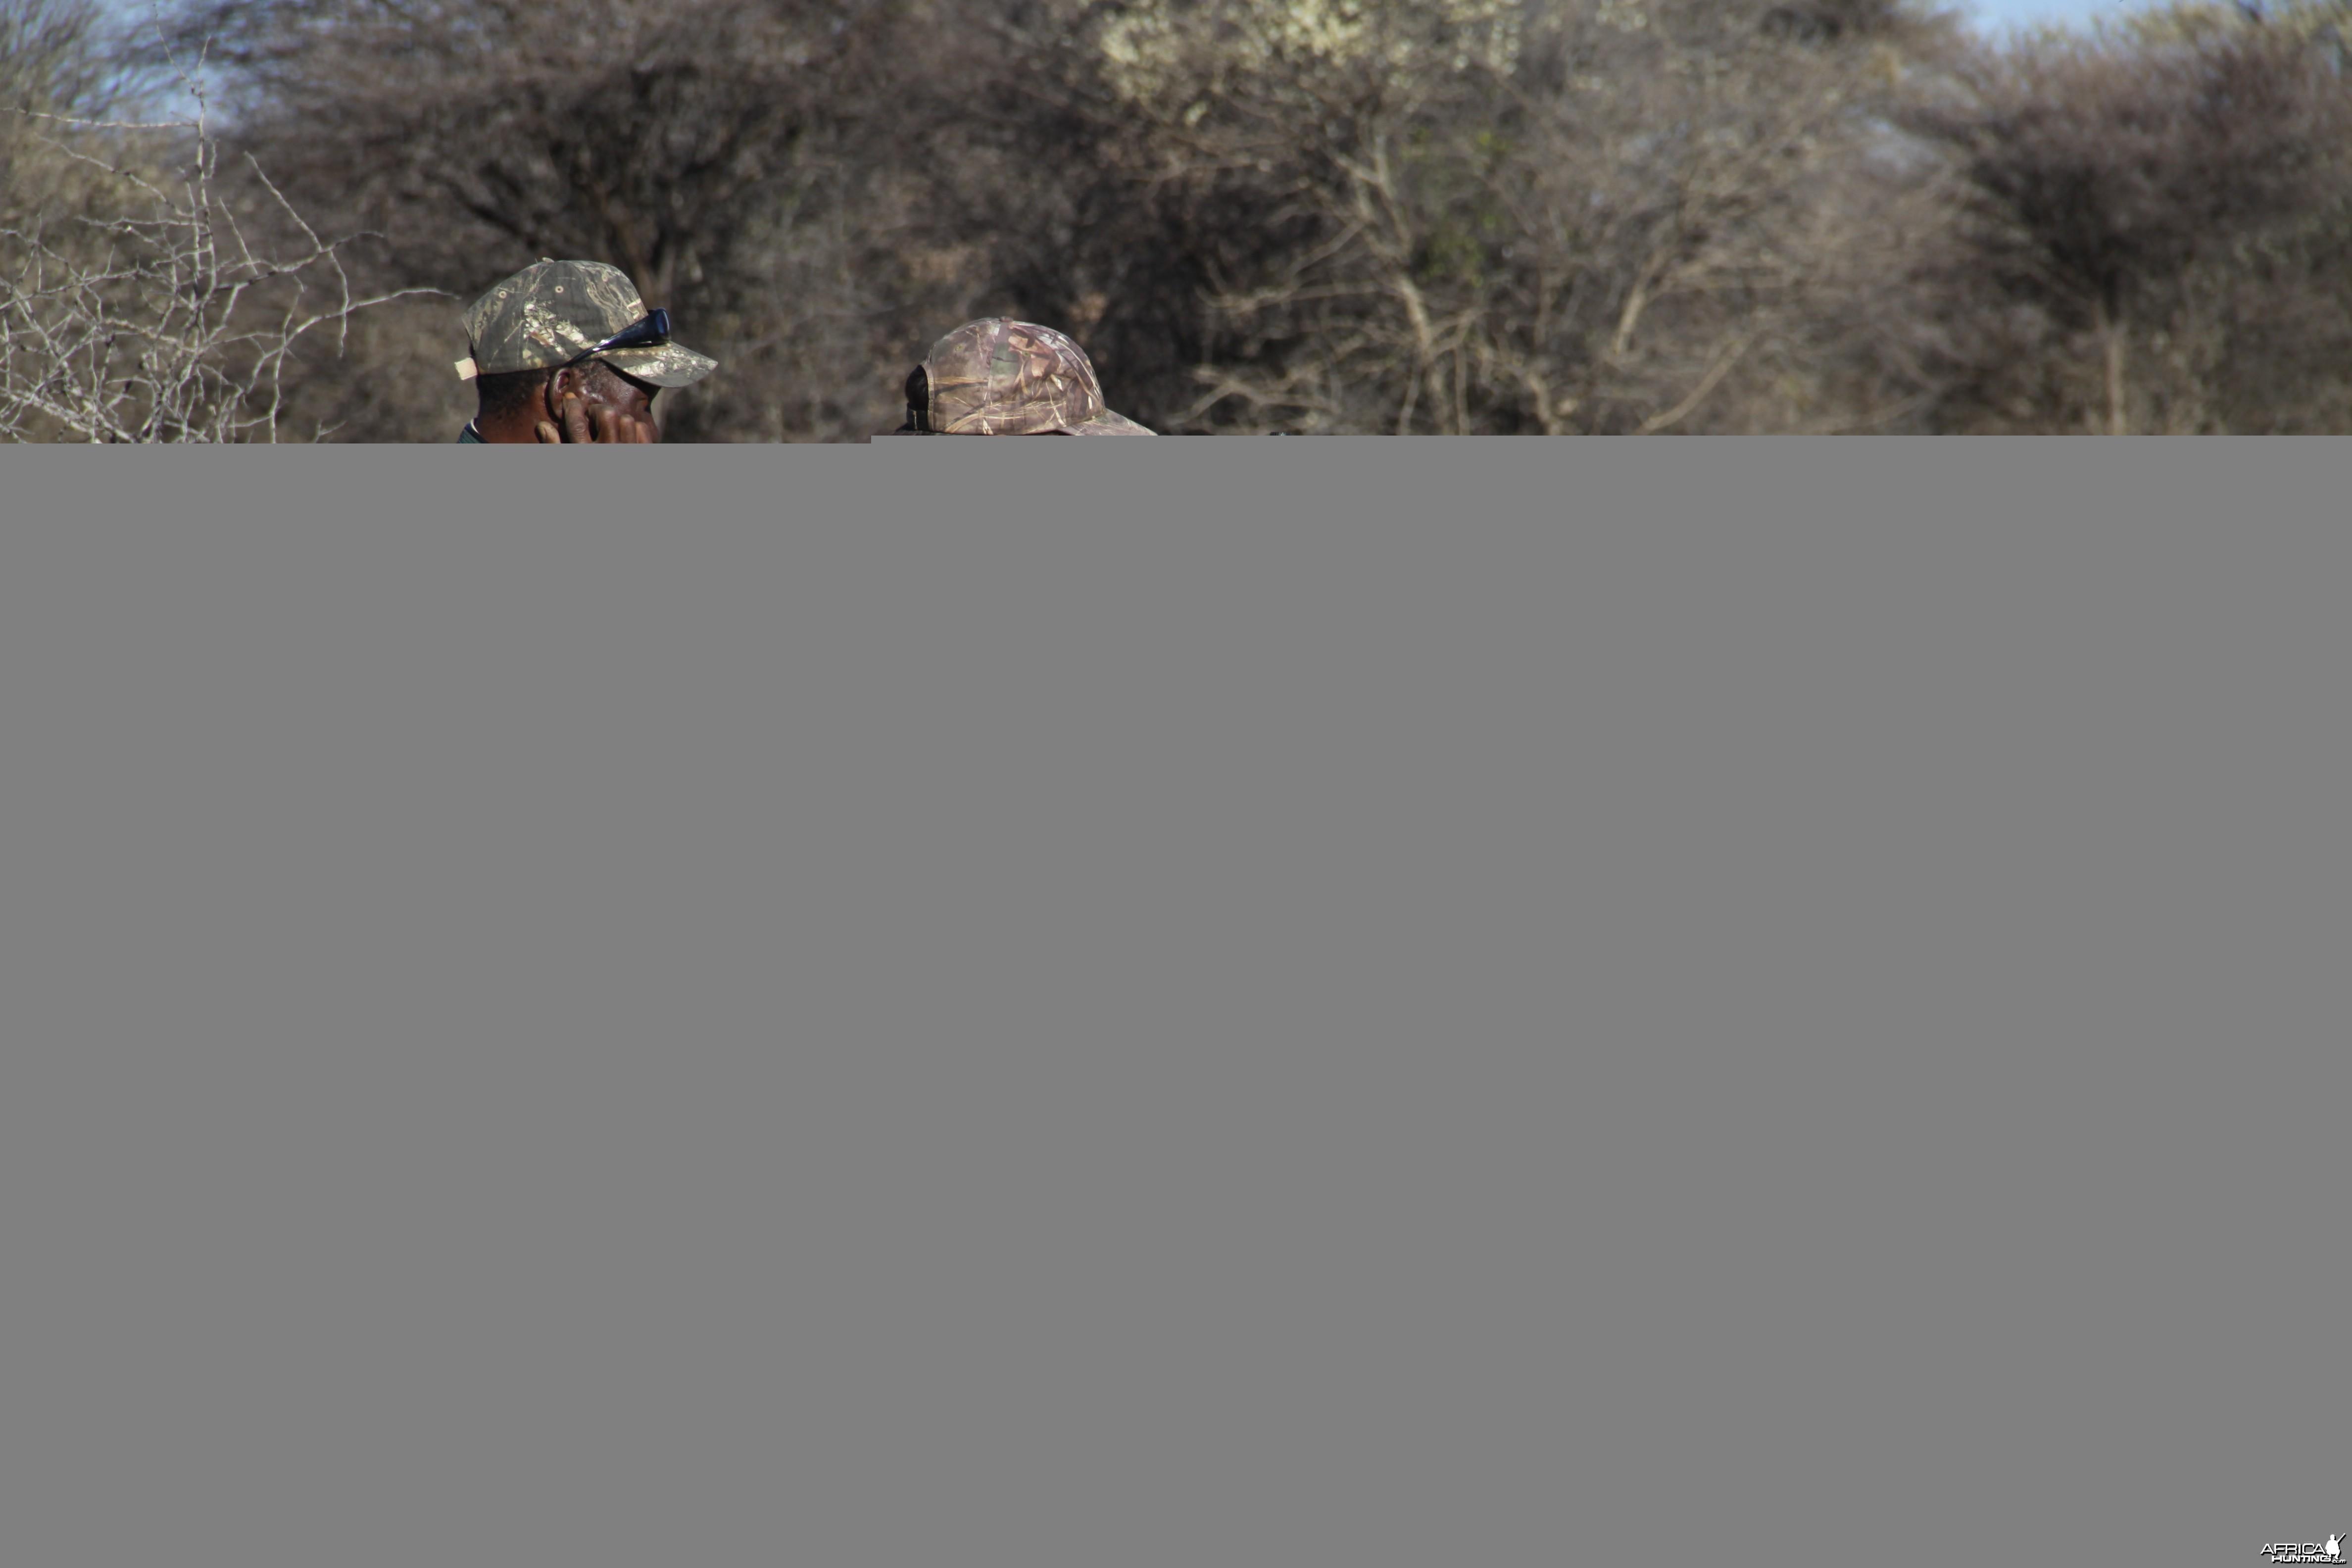 Ozondjahe Hunting Safaris in Namibia